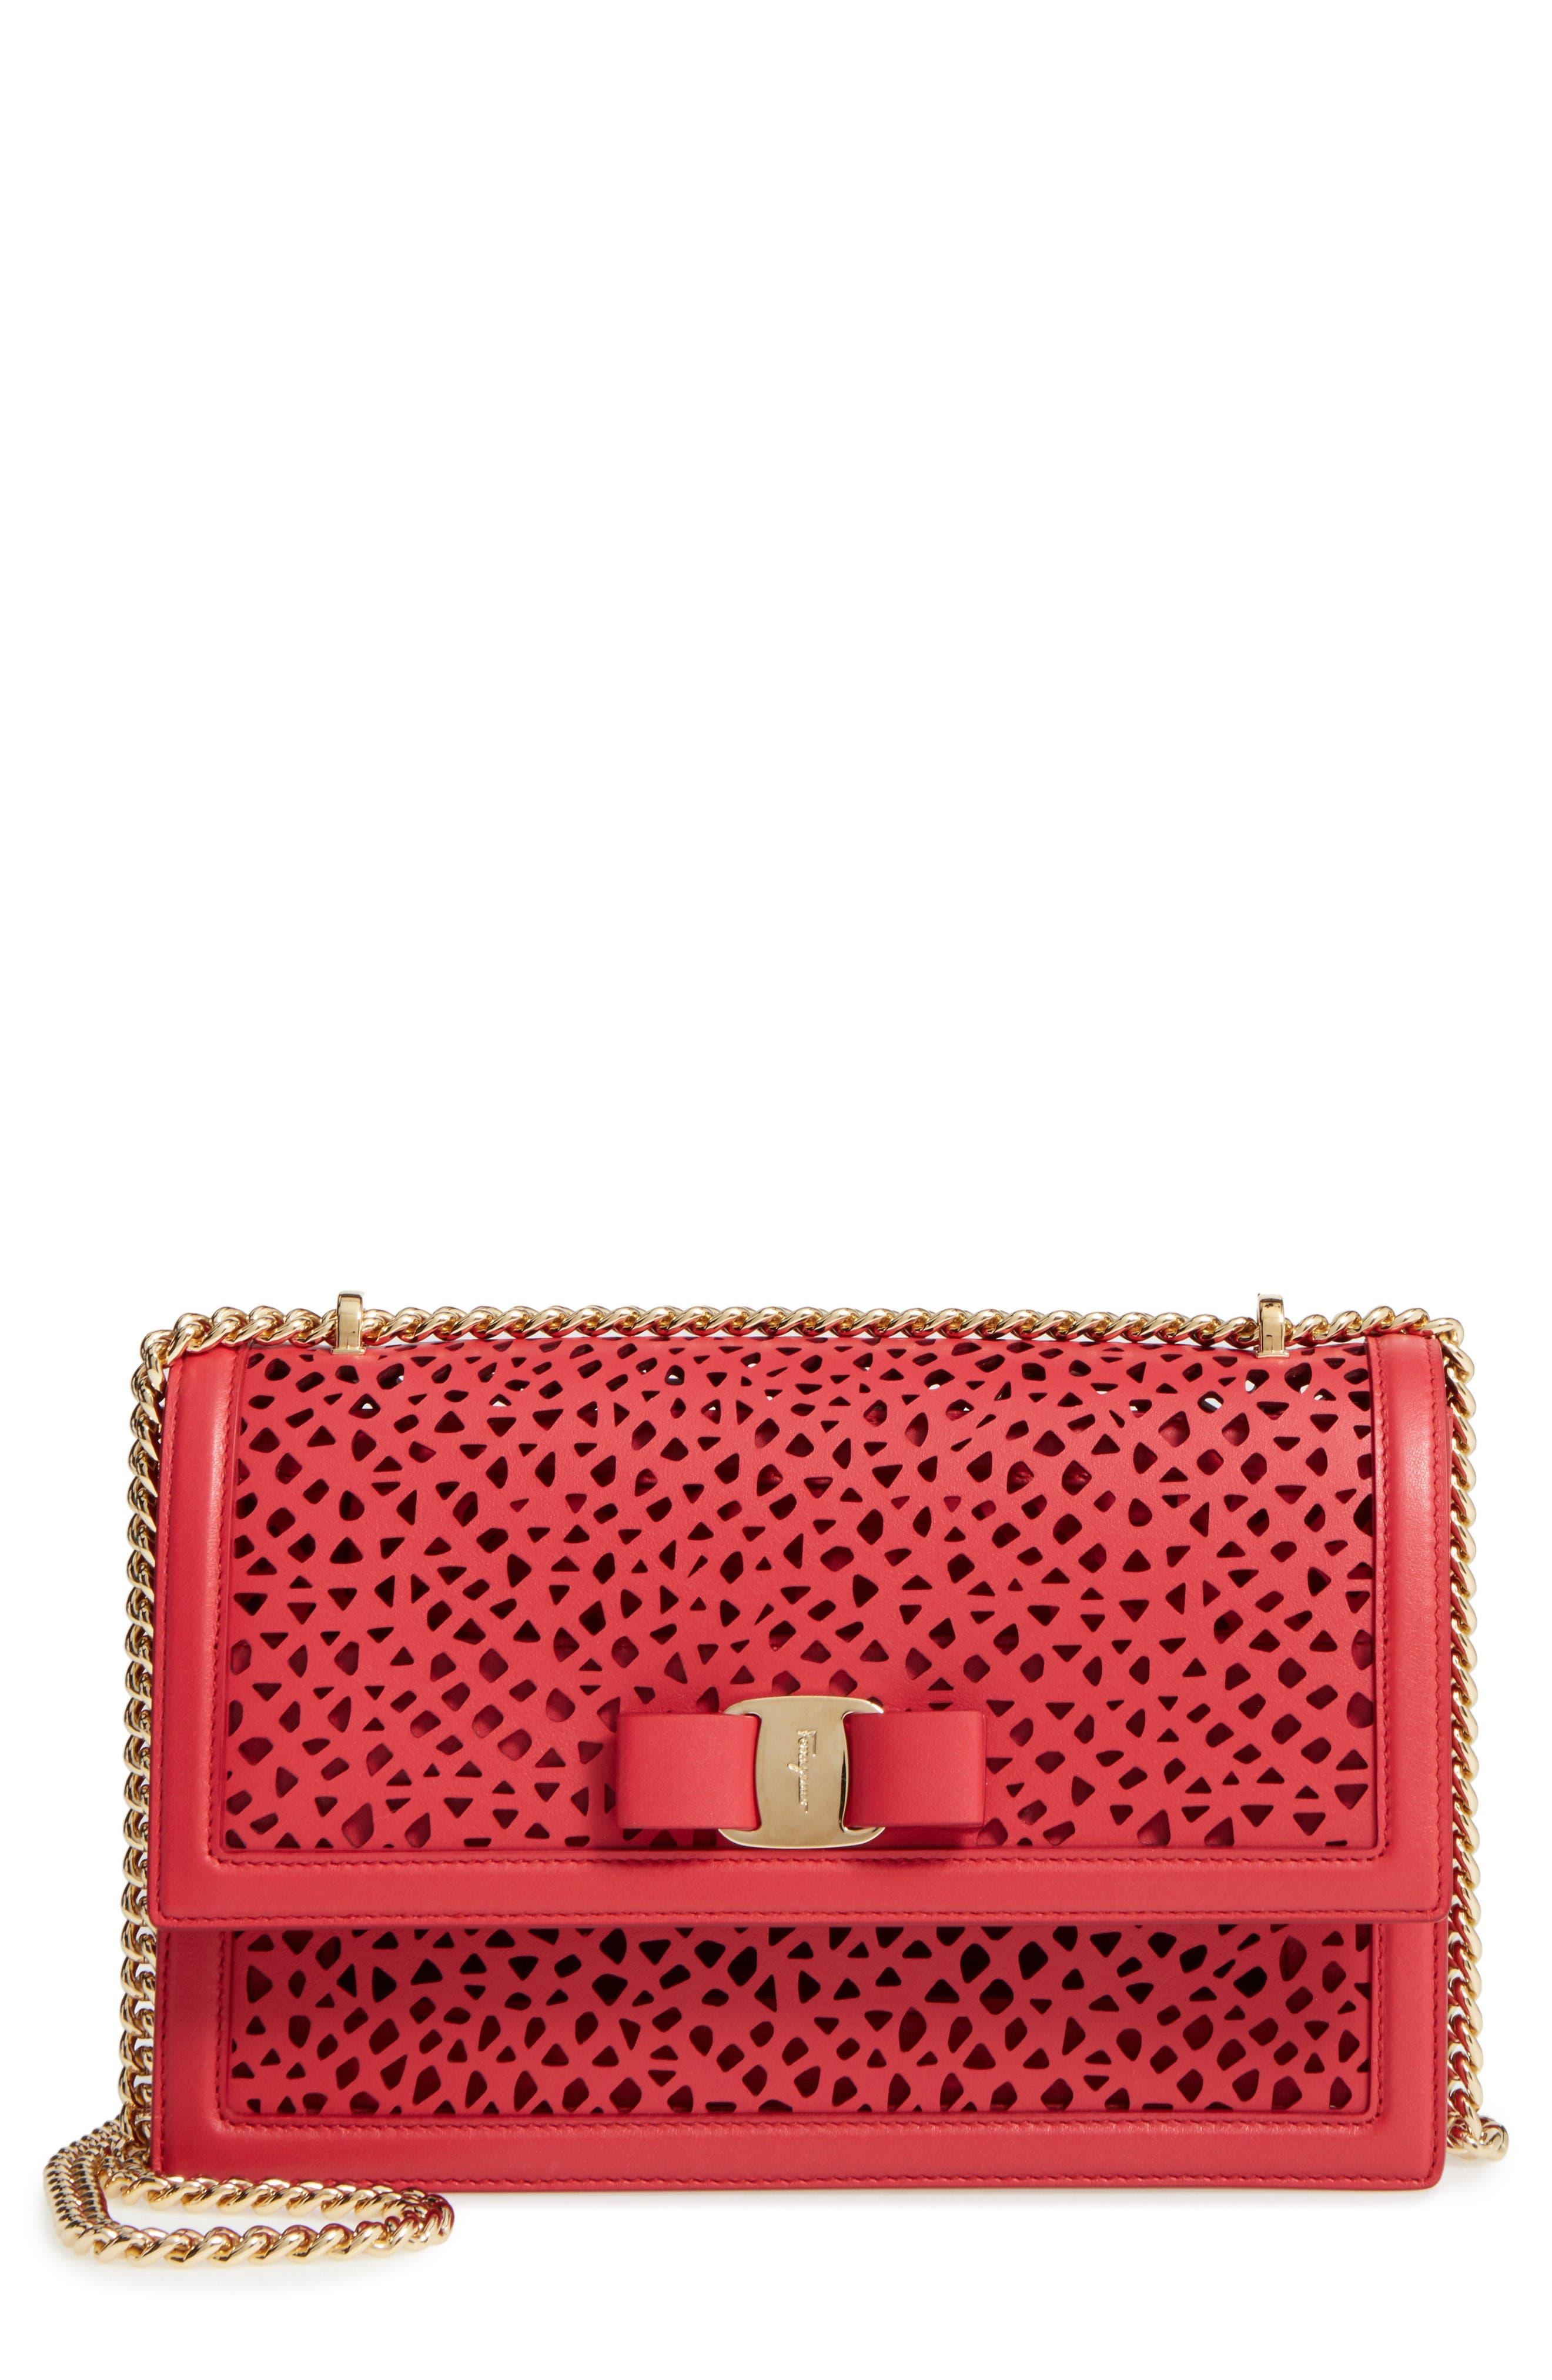 Alternate Image 1 Selected - Salvatore Ferragamo Medium Ginny Leather Shoulder Bag